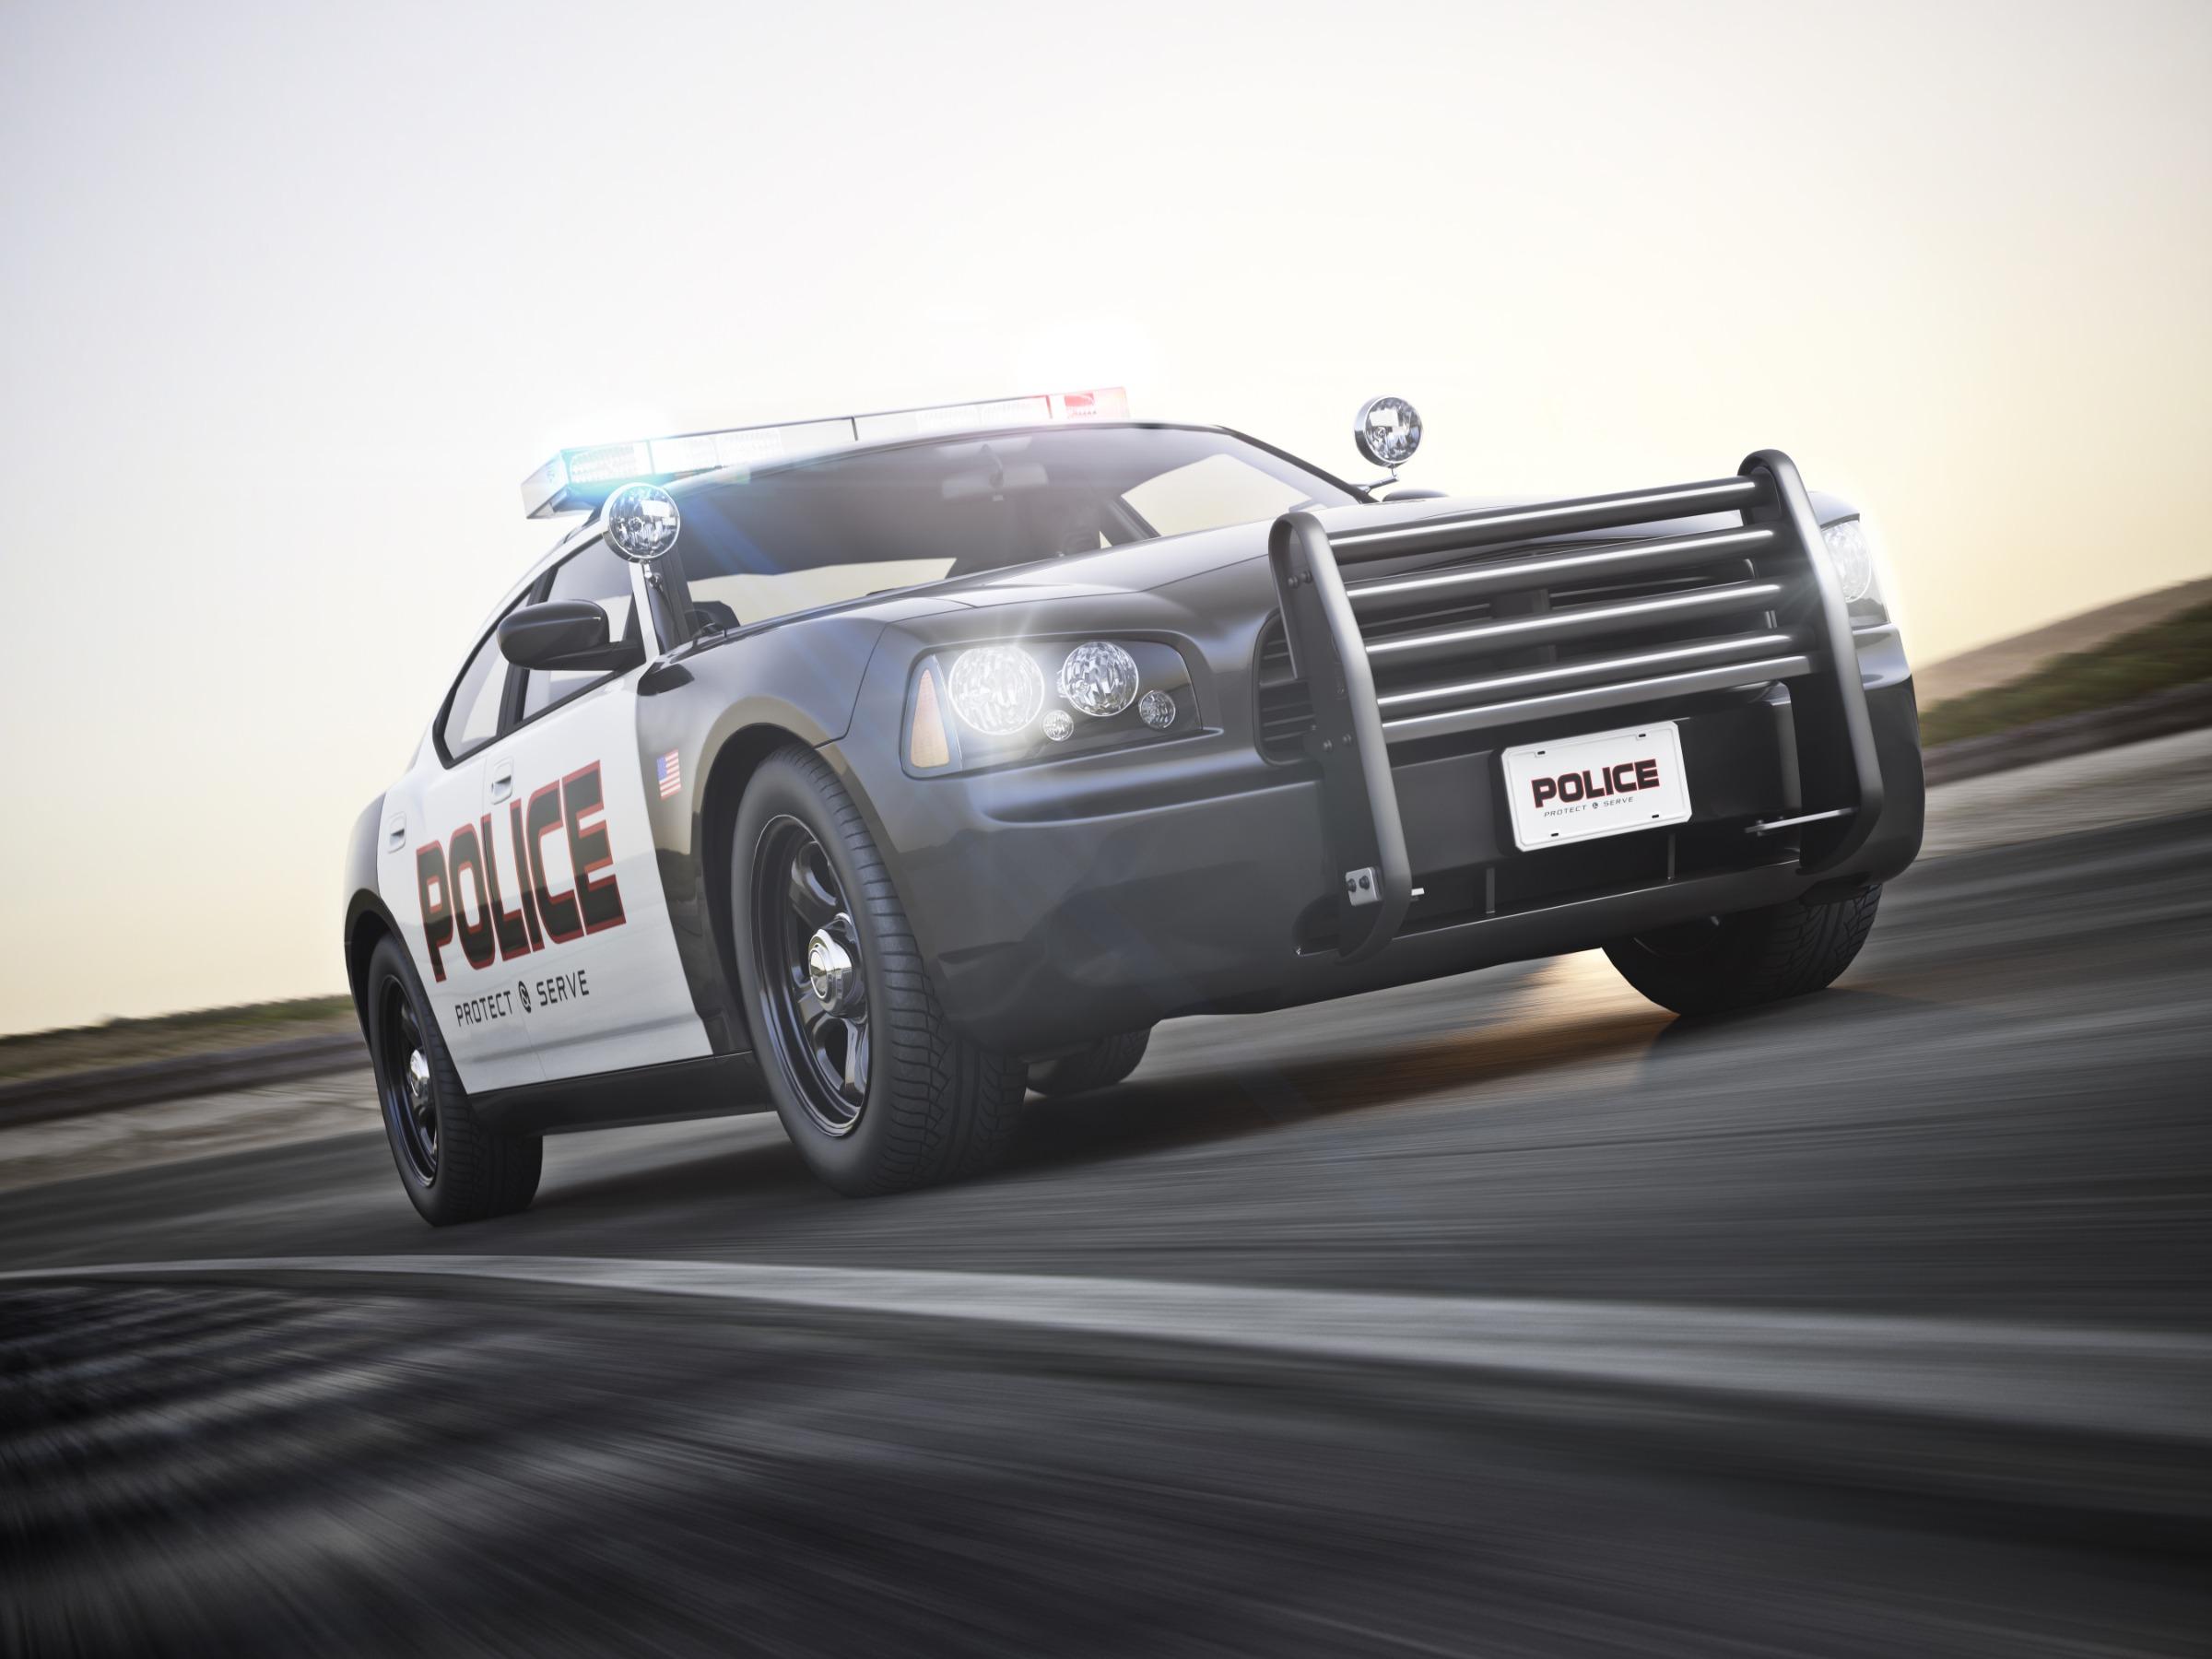 police vehicle charging